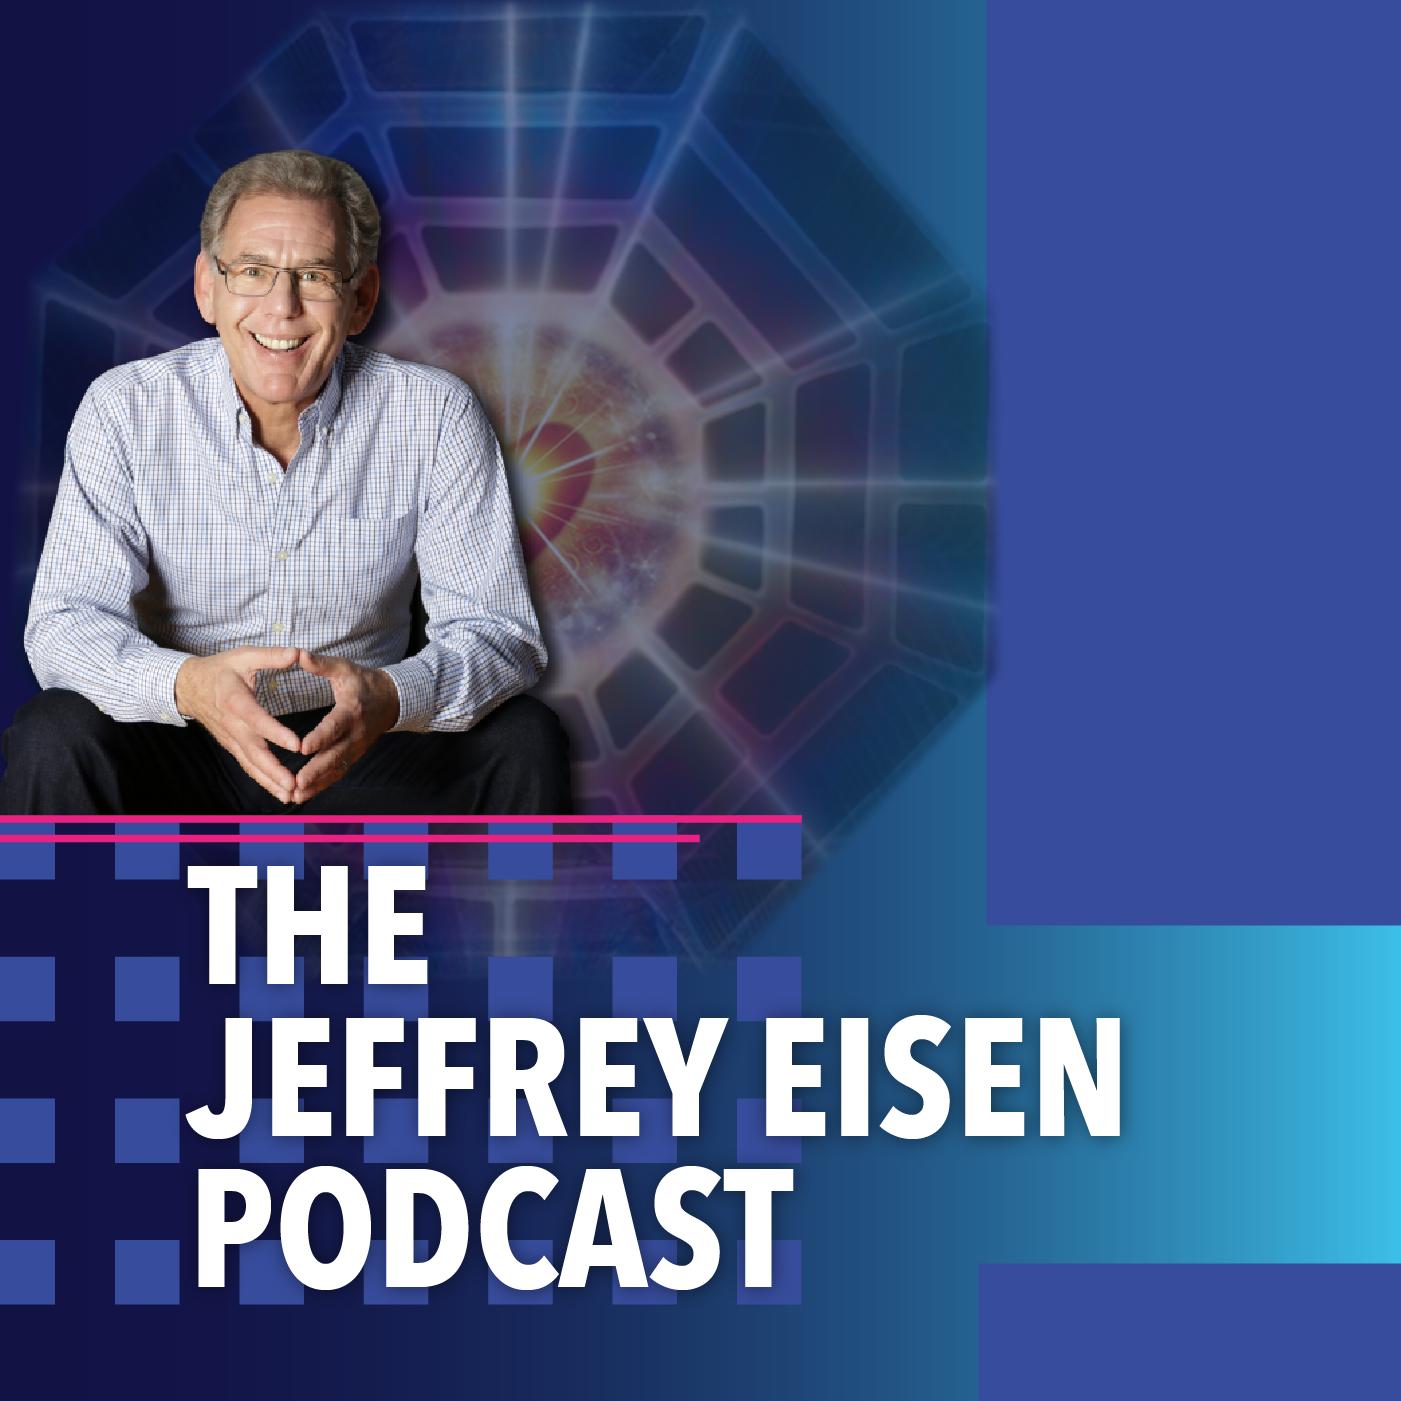 The Jeffrey Eisen Podcast show art